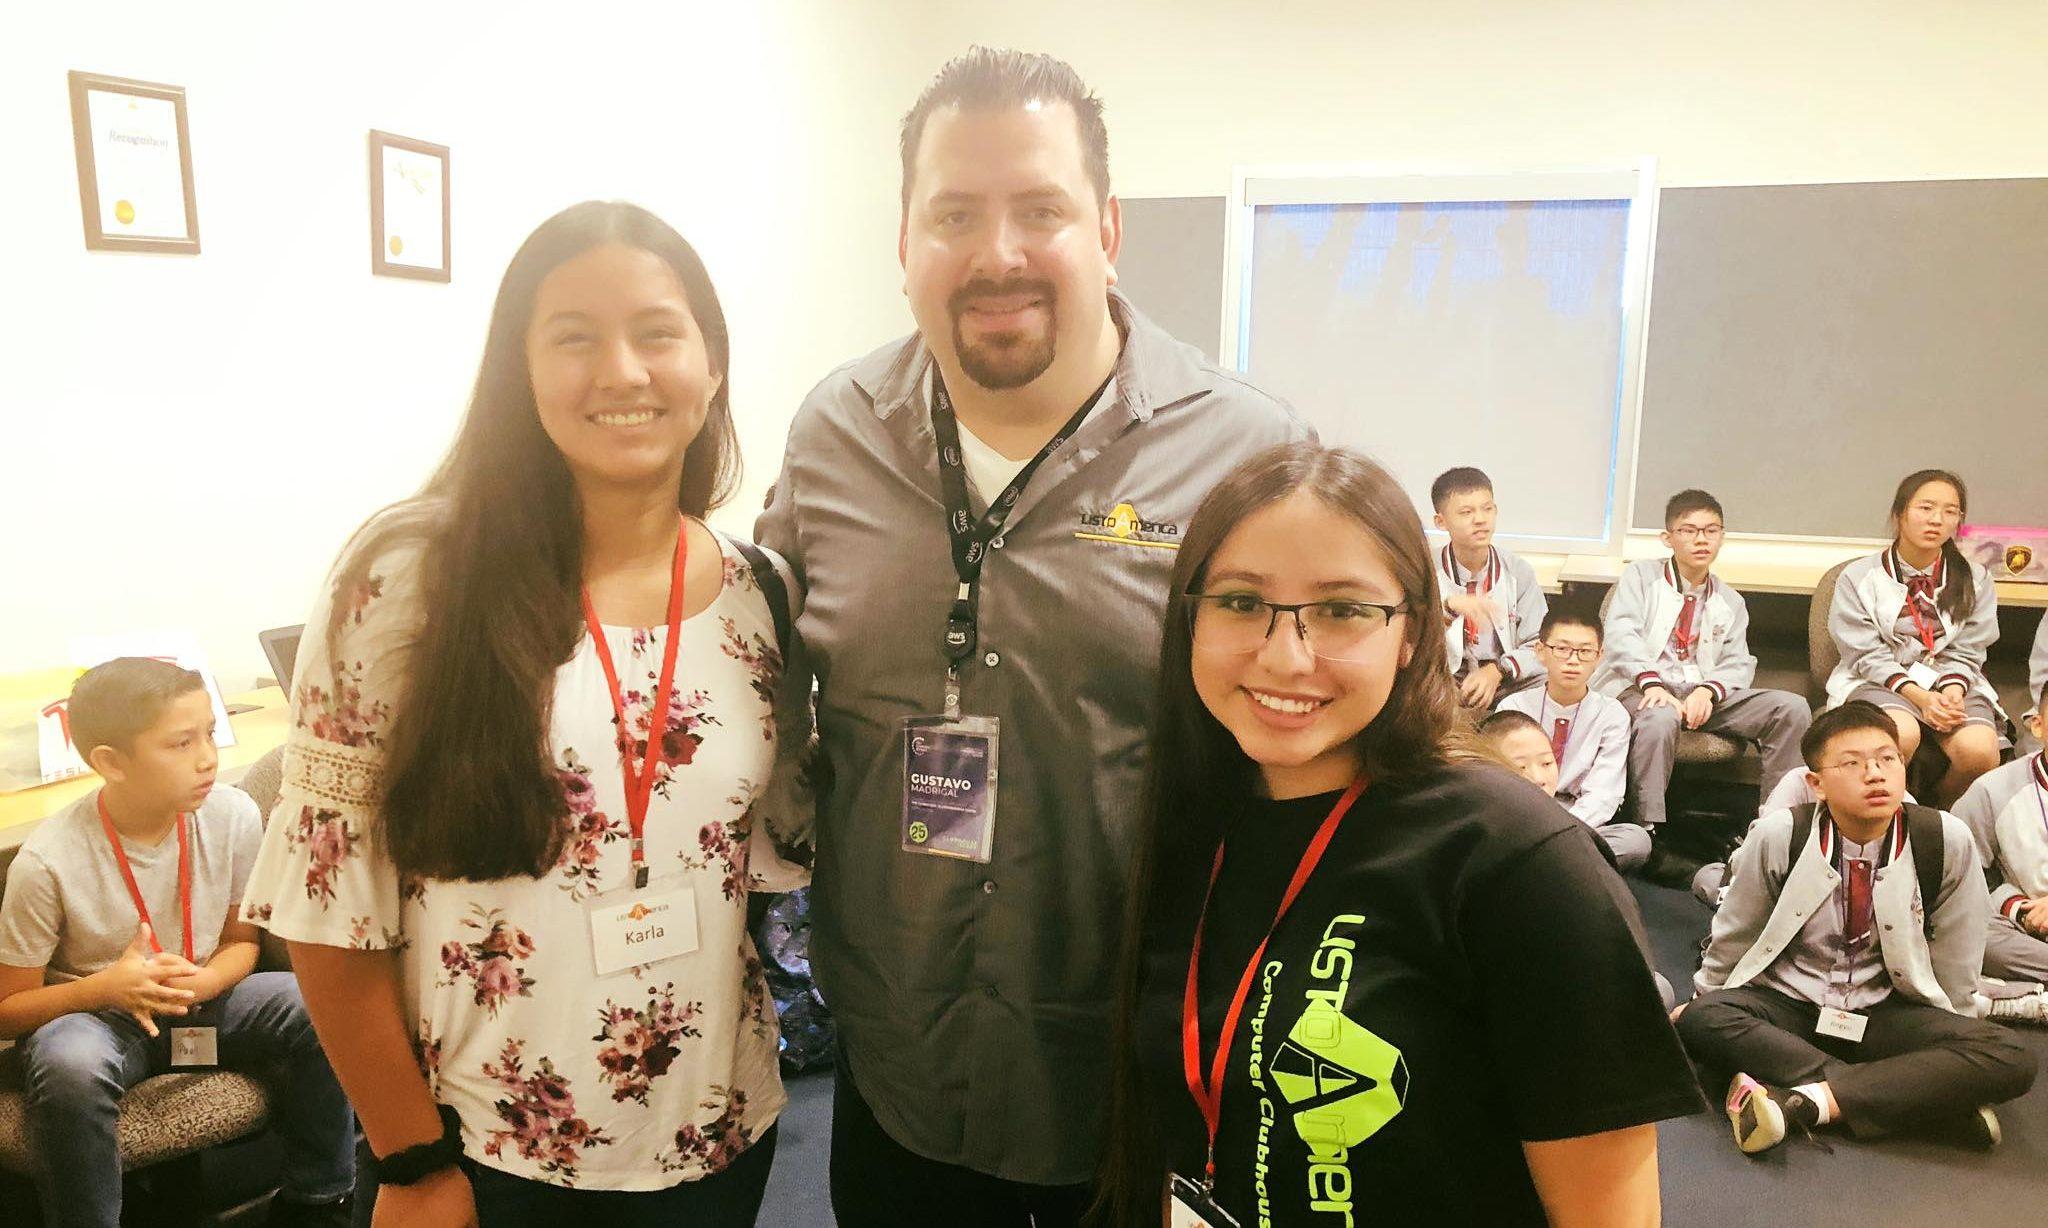 Karla, Gustavo, and Judith of ListoAmerica